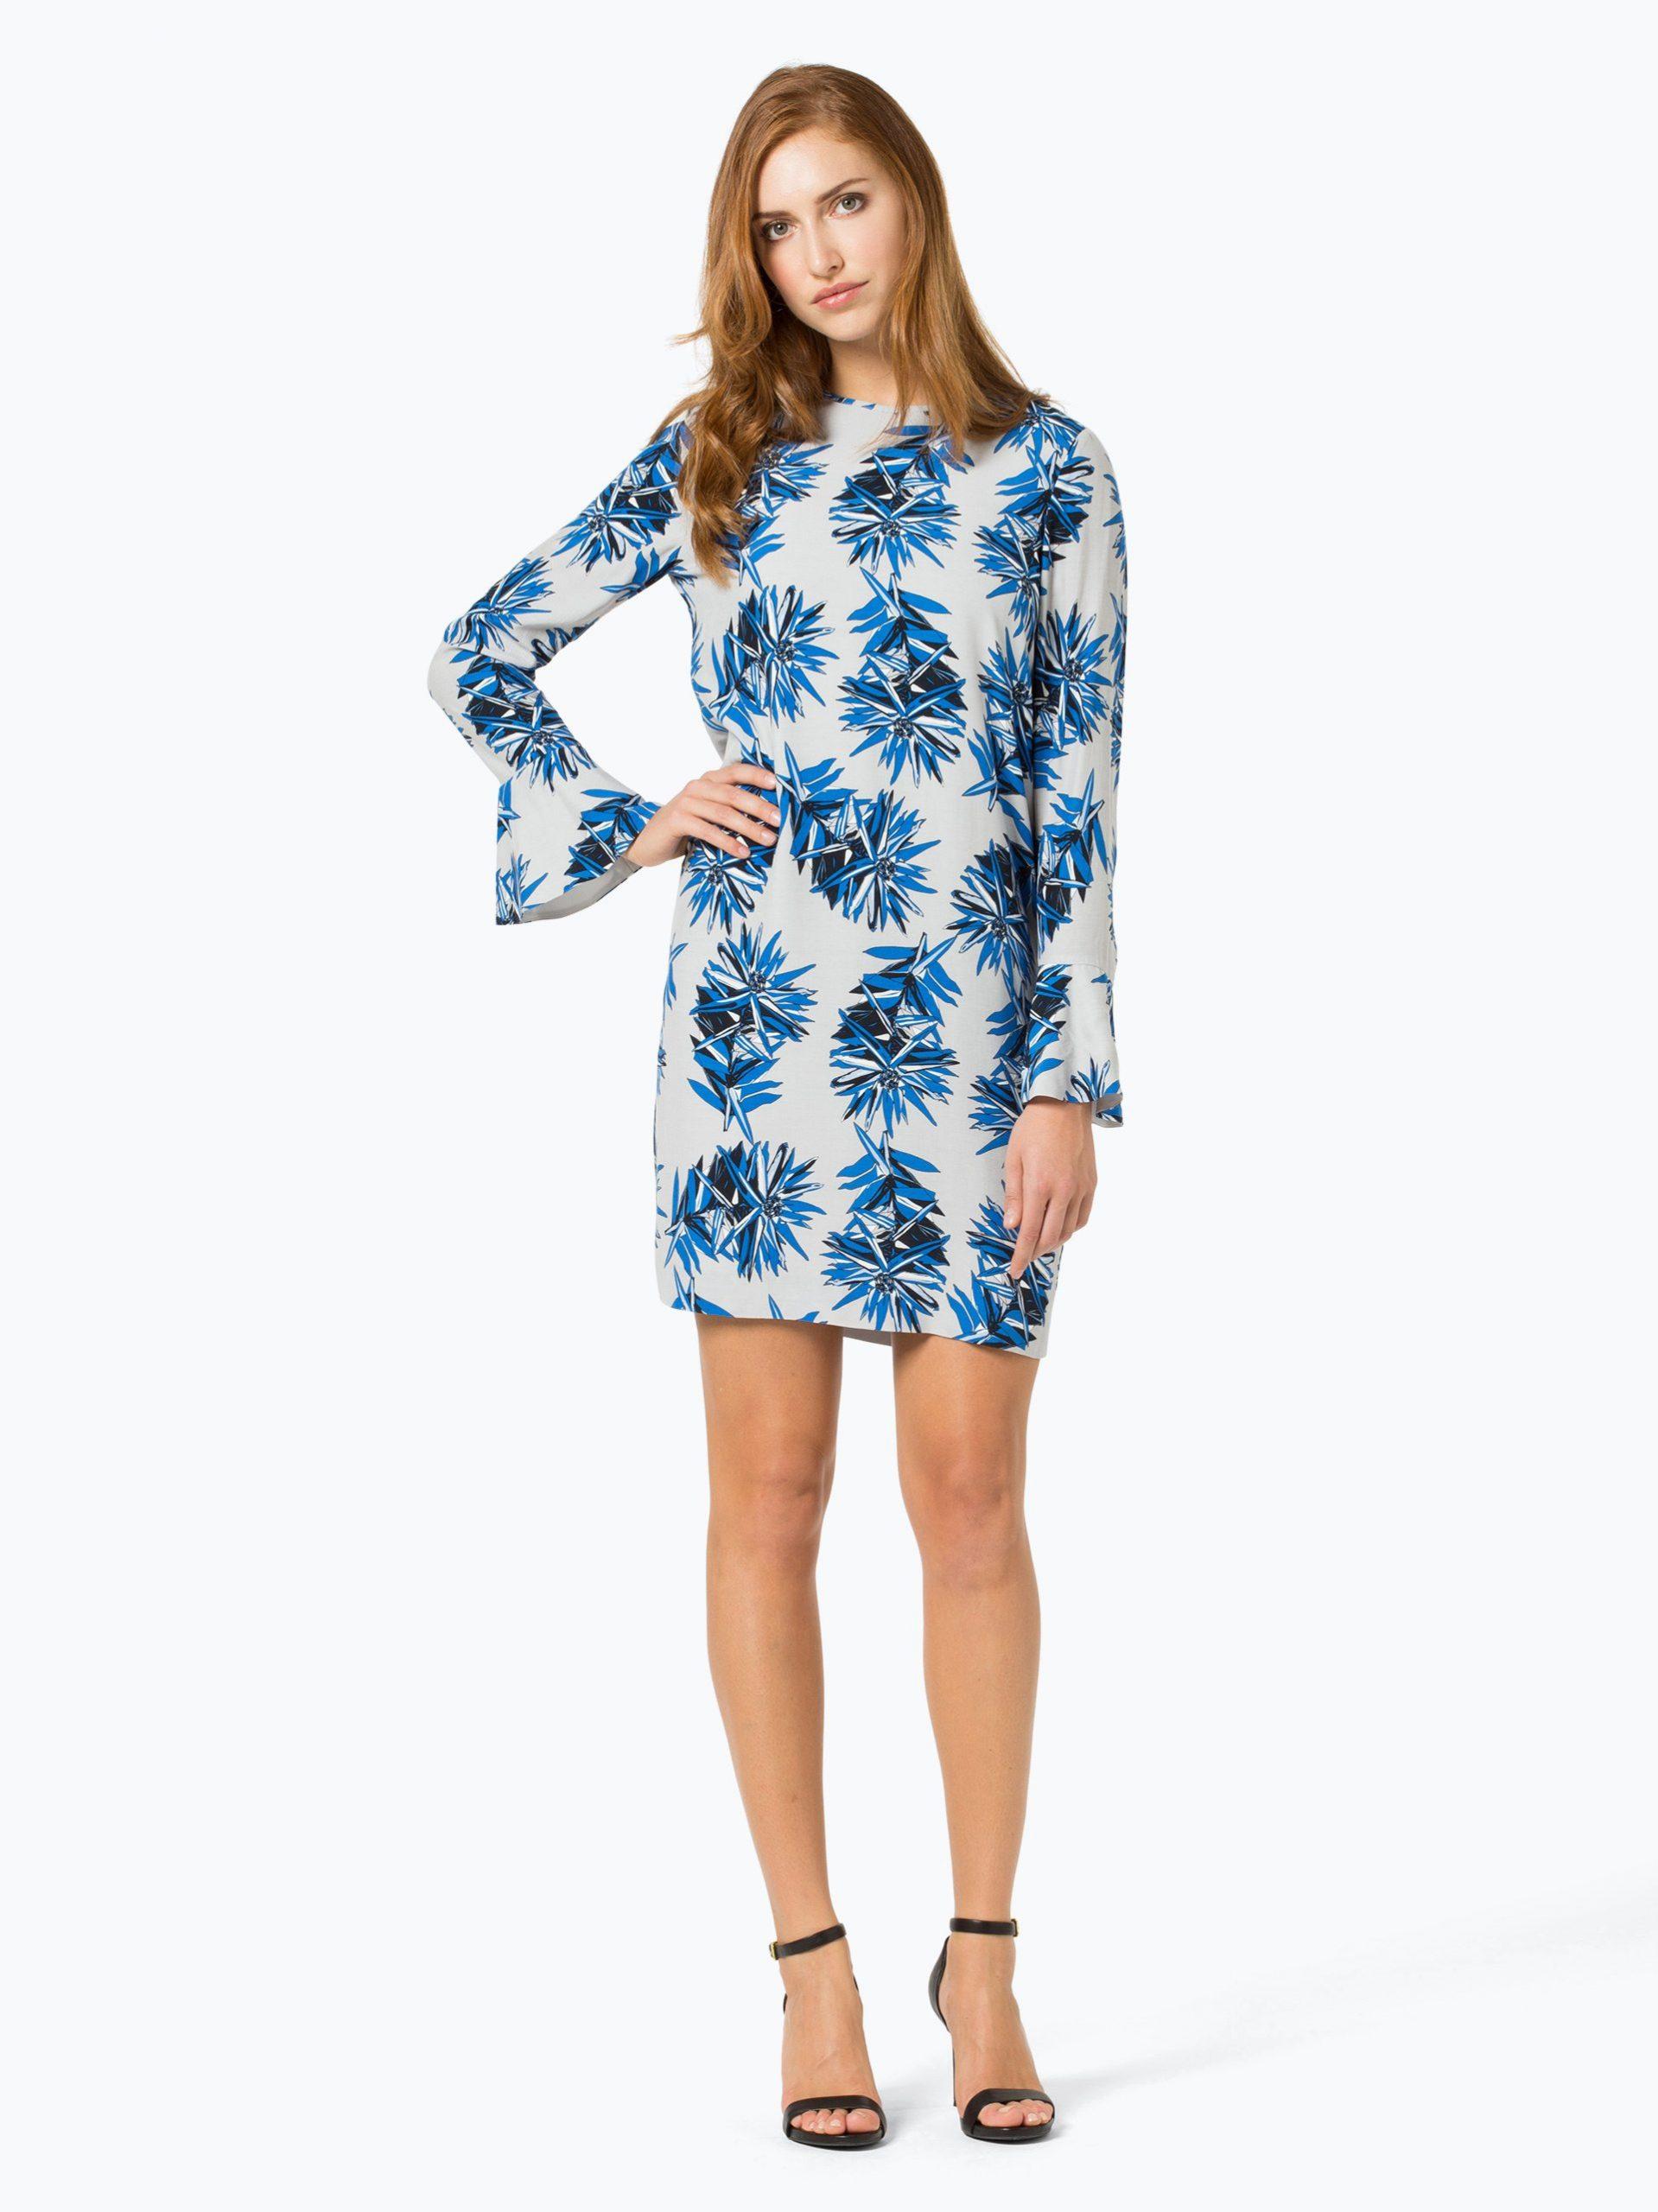 Tommy Hilfiger Damen Kleid  Jill Online Kaufen  Vangraaf